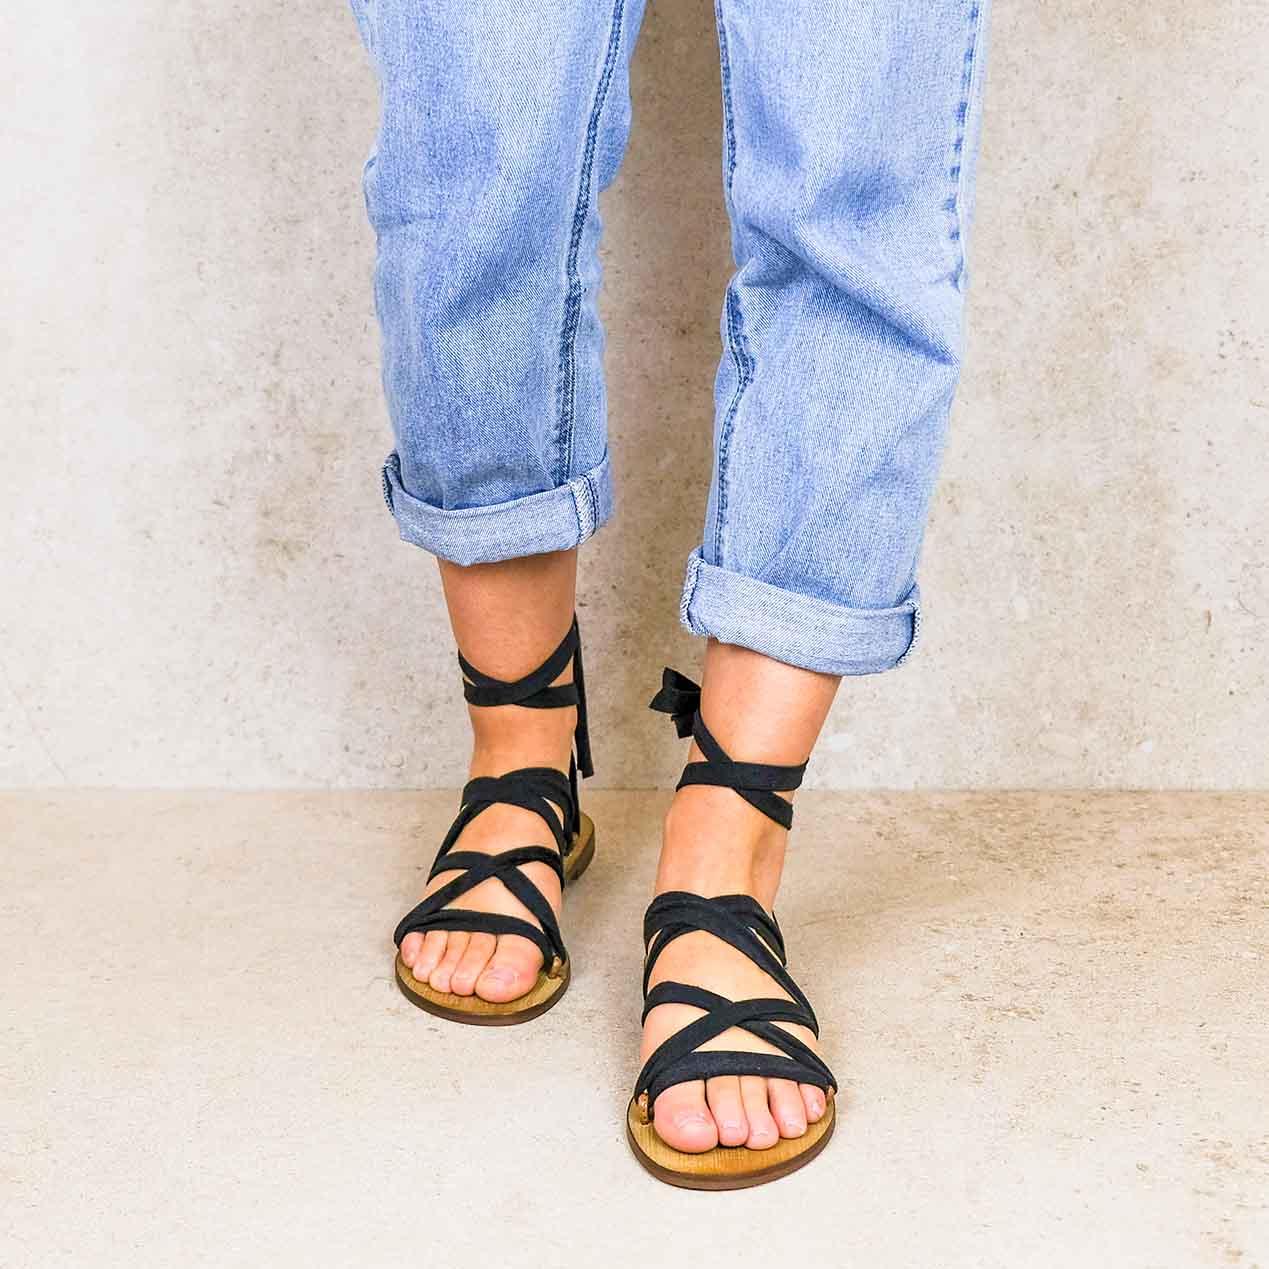 Capri_lintsandalen sandals travelsandals vegan sustainable sandals wikkelsandalen